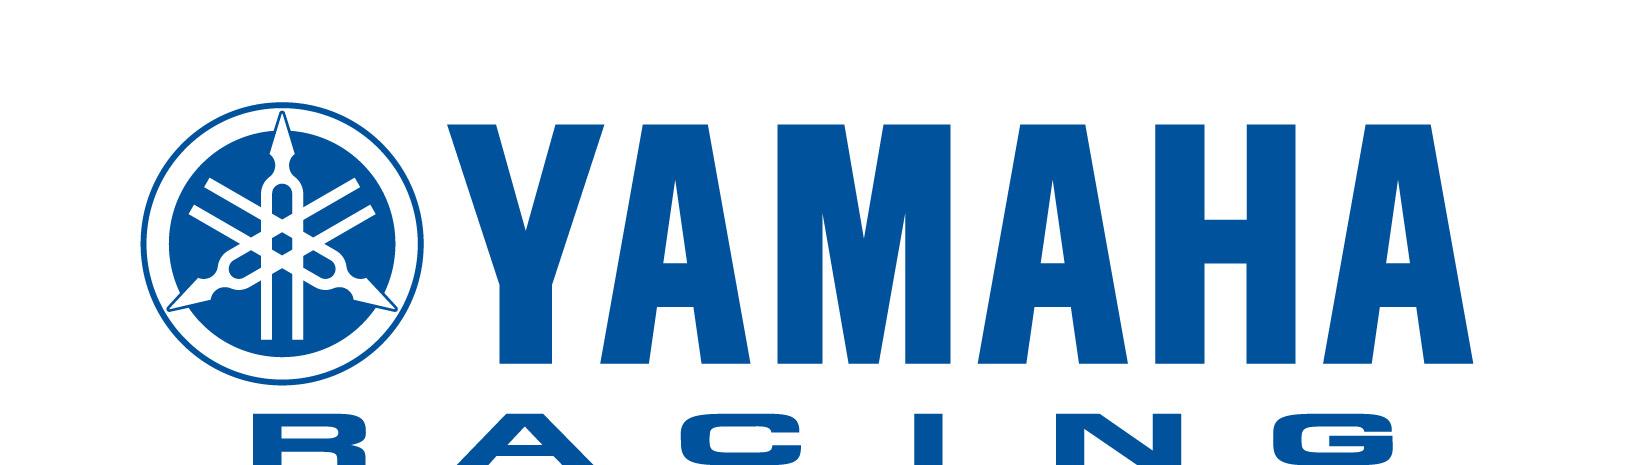 historia logo yamahy � trzy kamertony i ich tw243rca